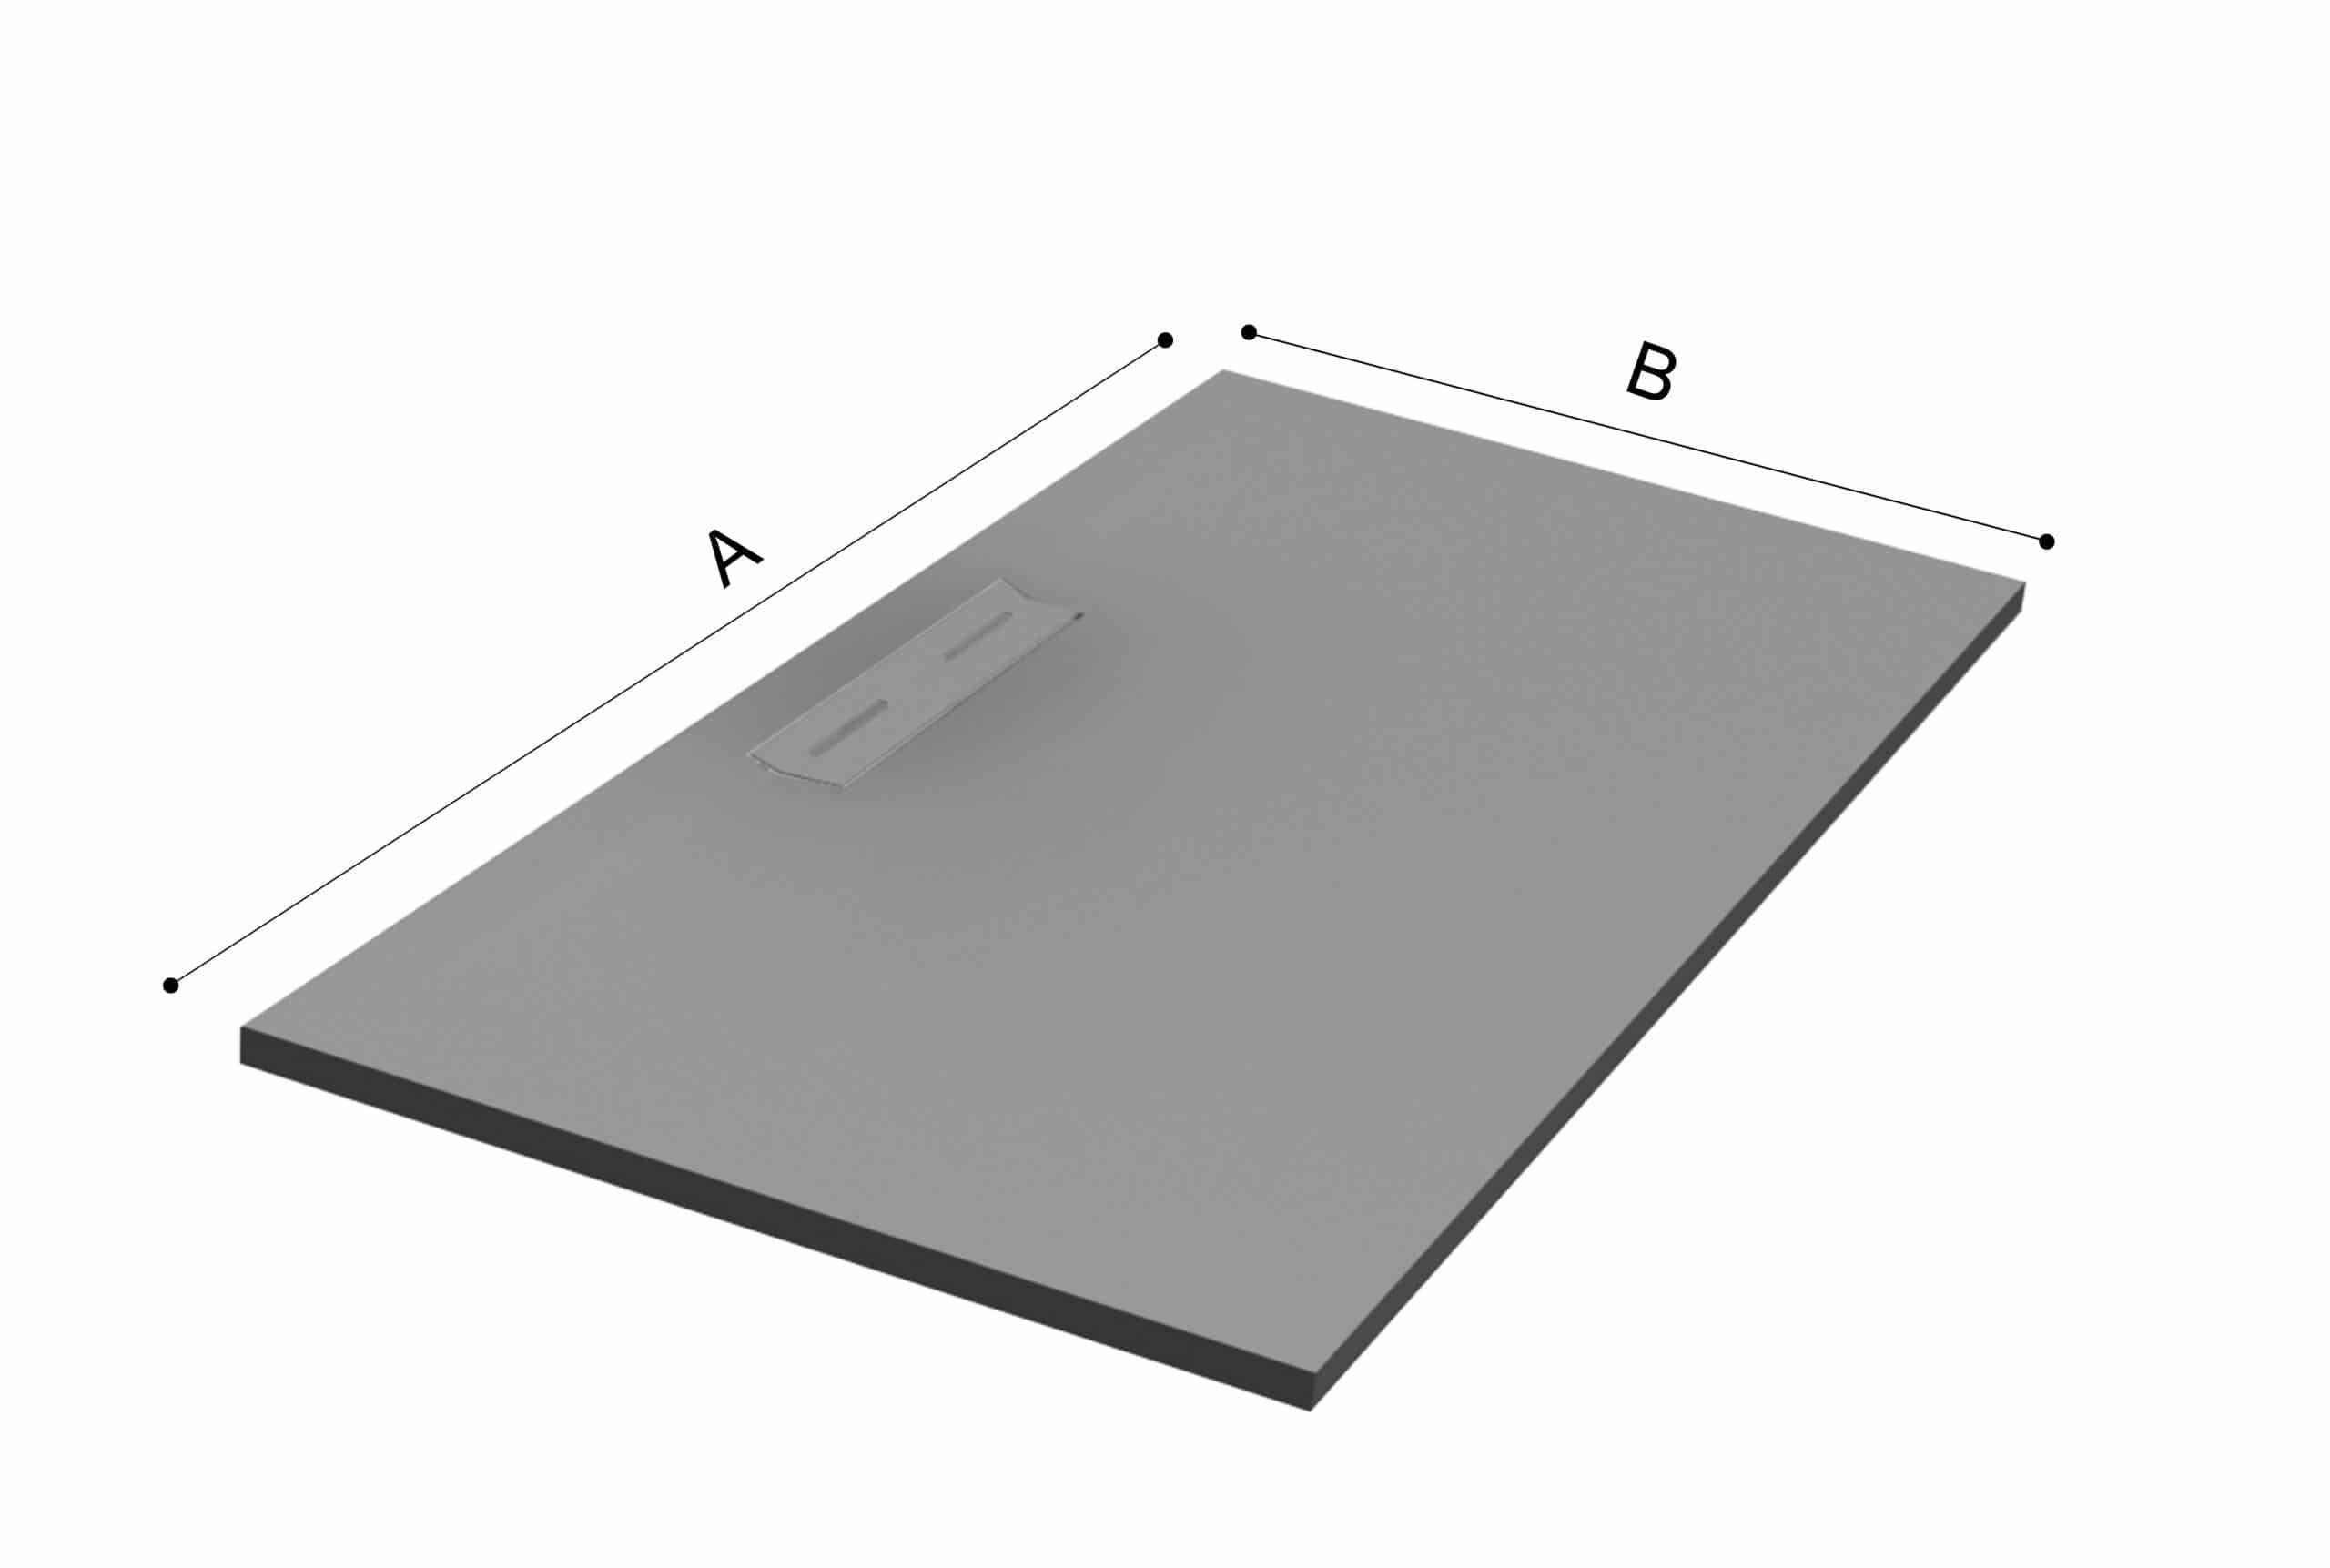 Oka Shower Tray Dimensions